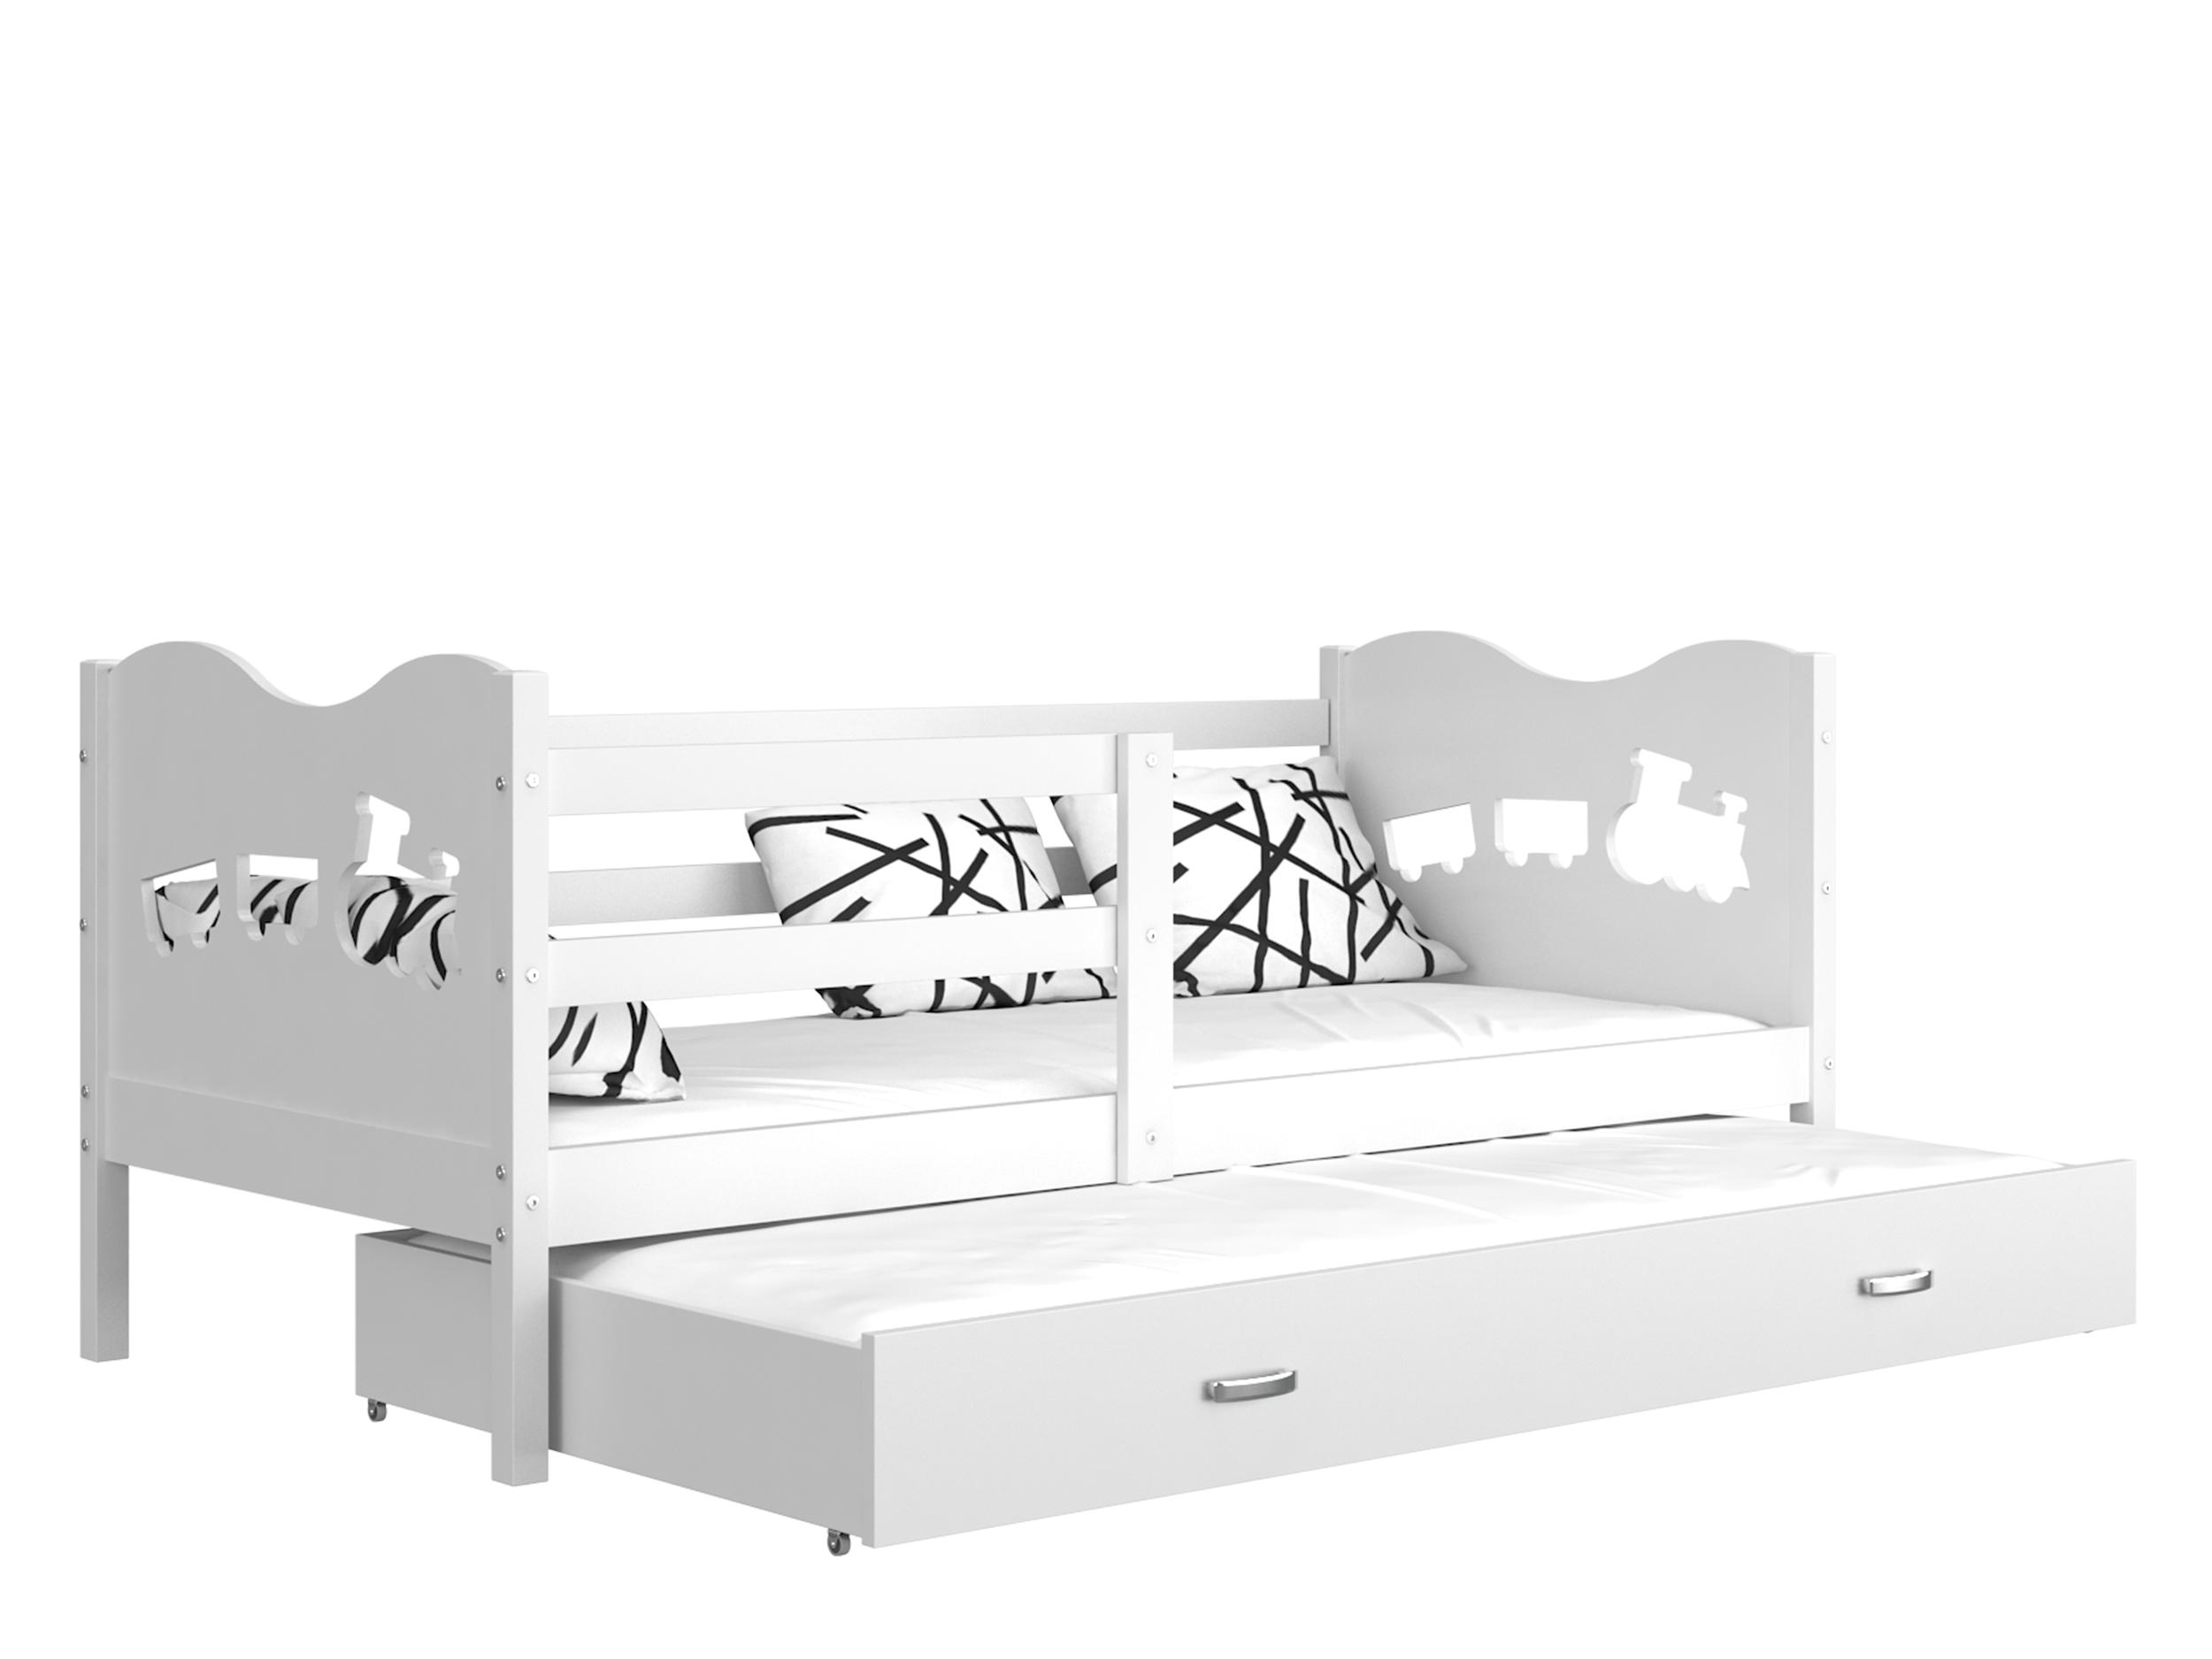 ArtAJ Detská posteľ MAX P2 / MDF 200 x 90 cm Farba: Biela / biela 200 x 90 cm, s matracom